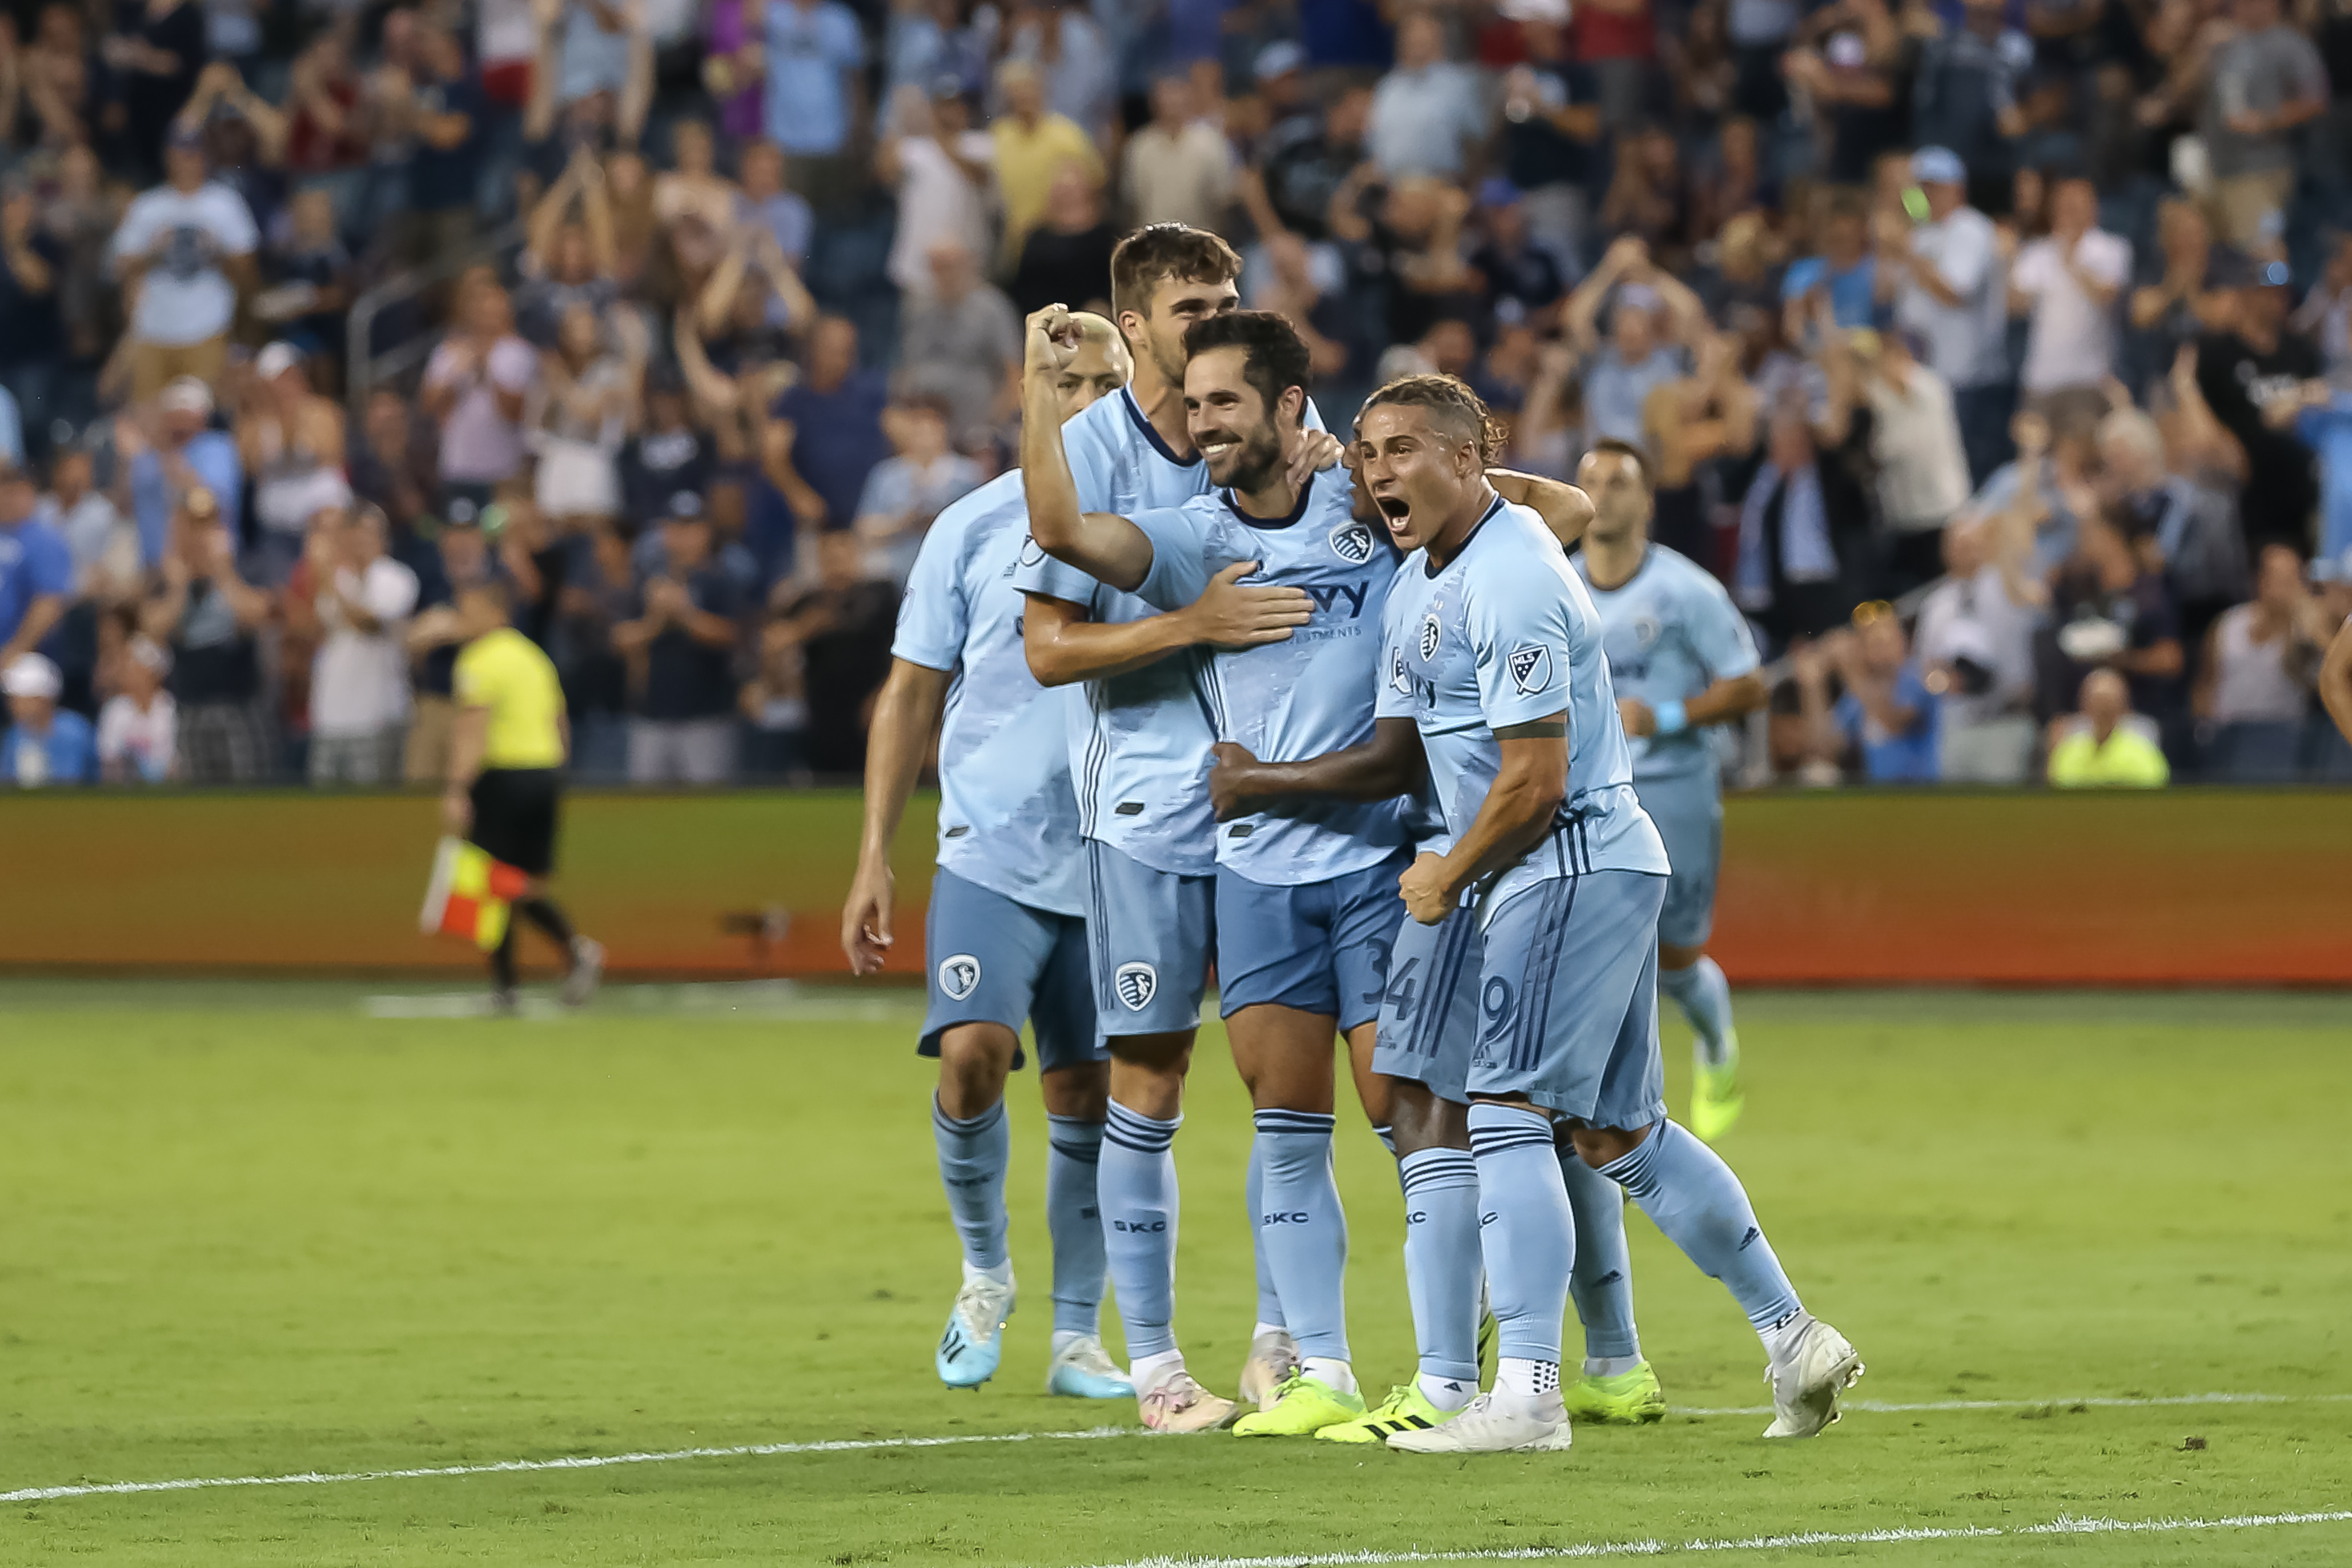 SOCCER: AUG 17 MLS - San Jose Earthquakes at Sporting Kansas City